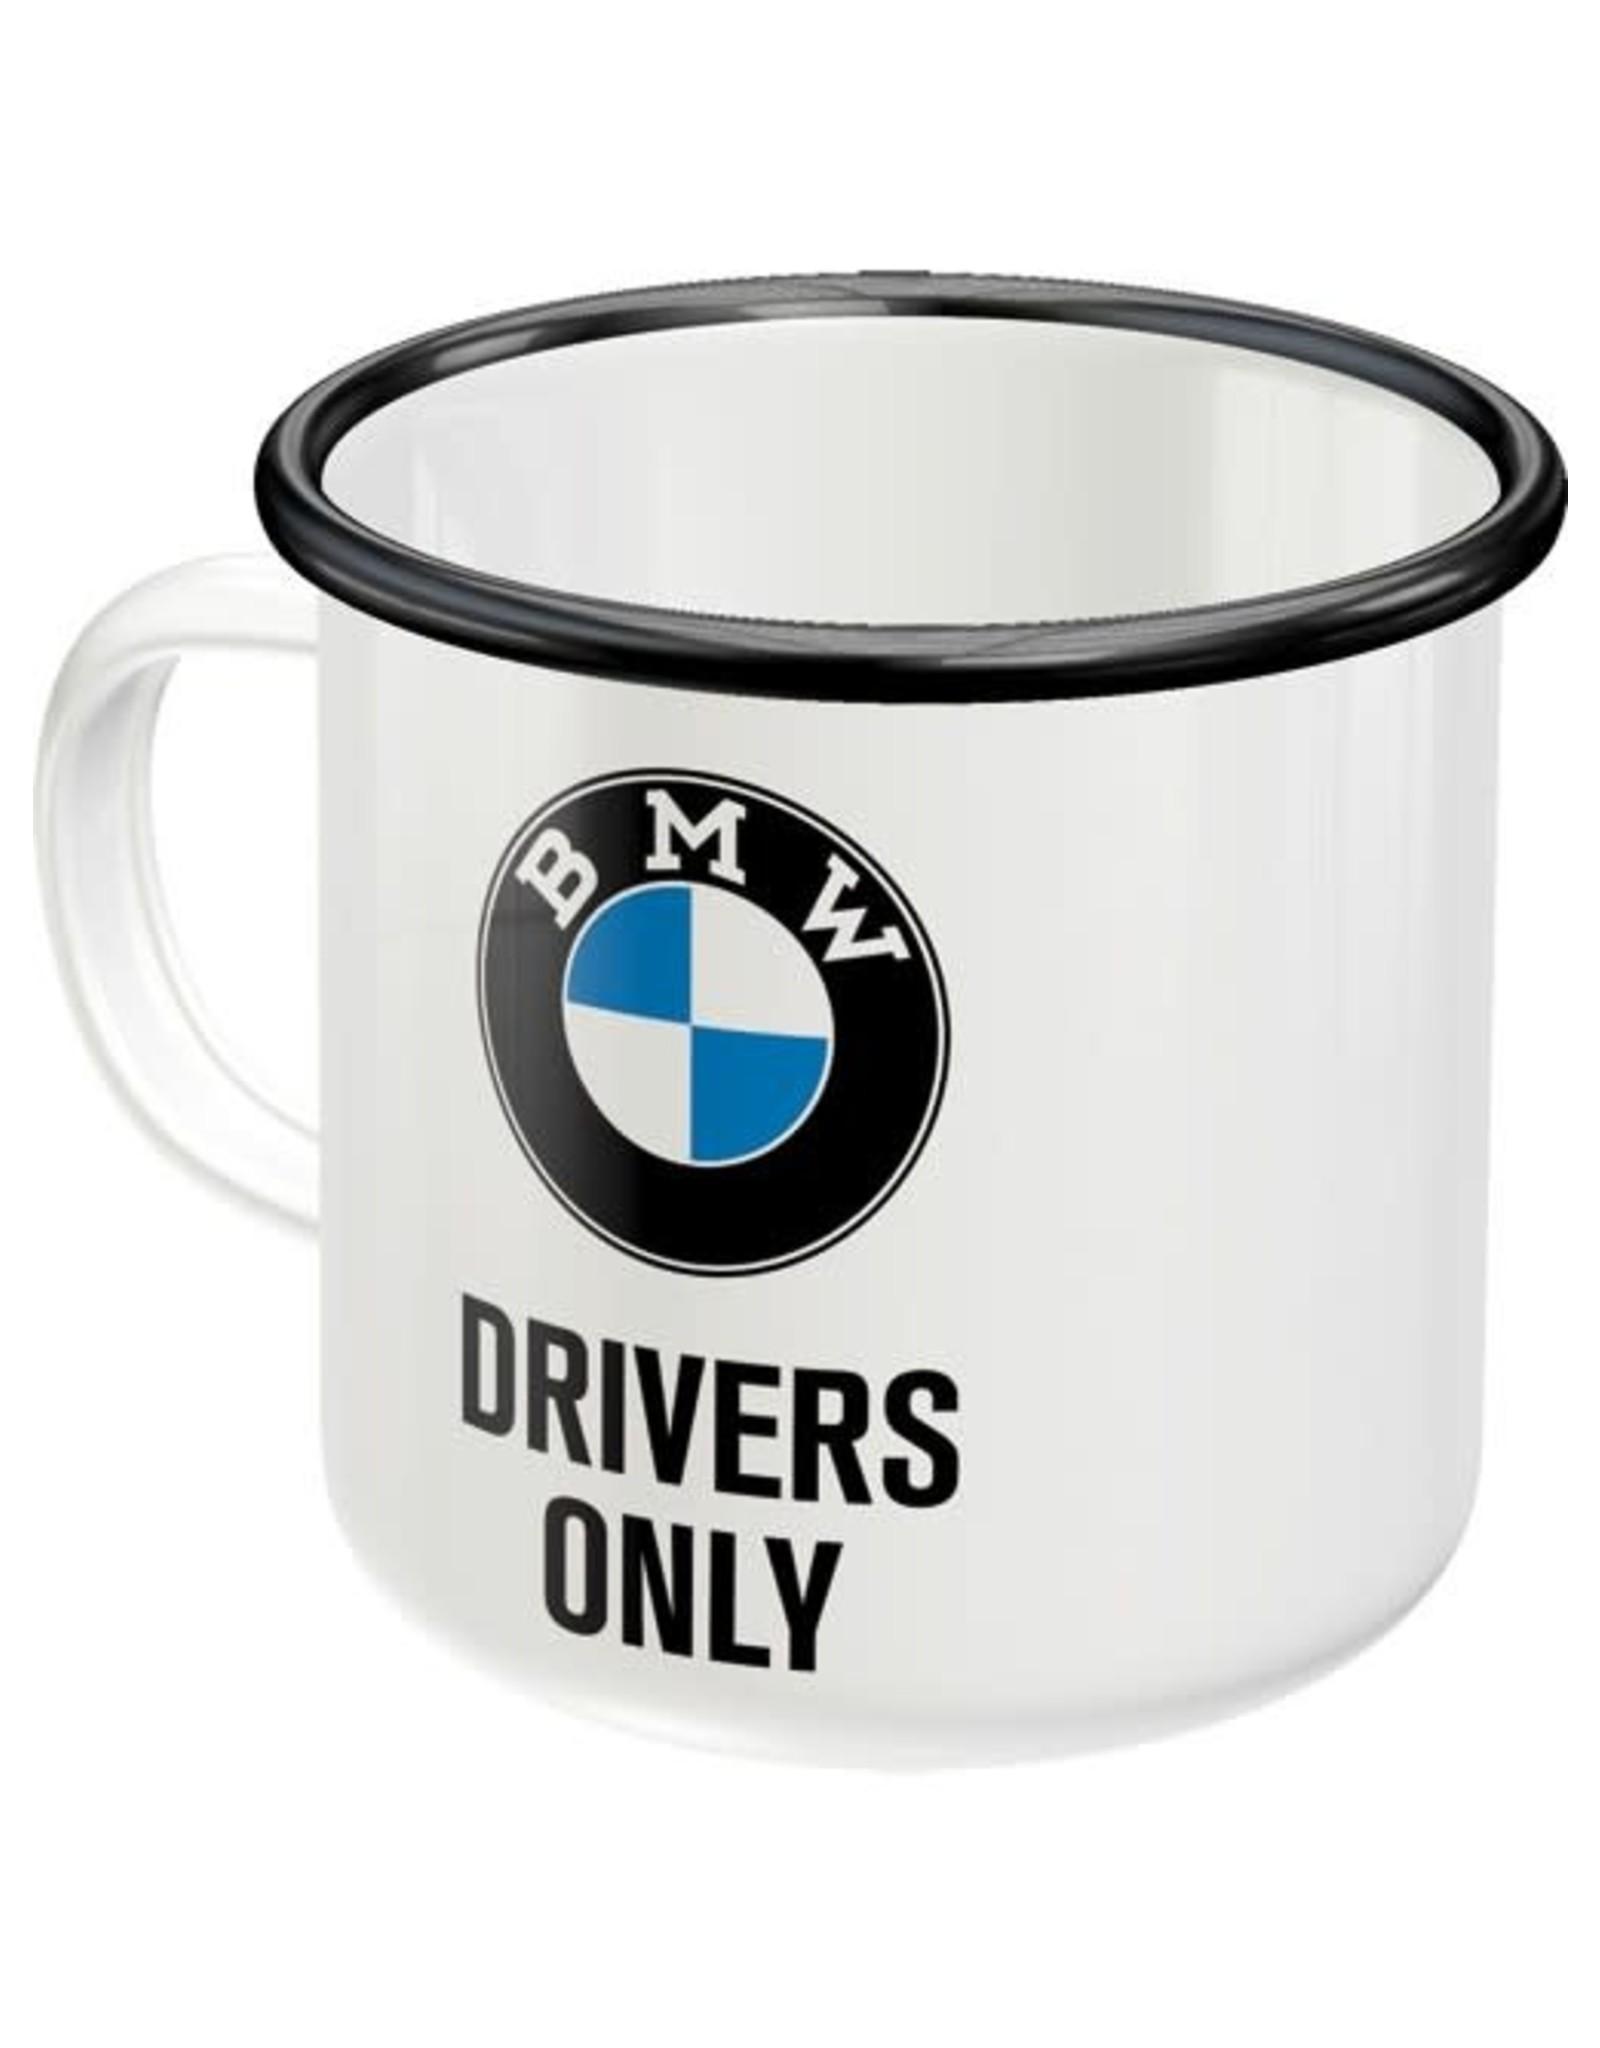 enamel mug - BMW drivers only